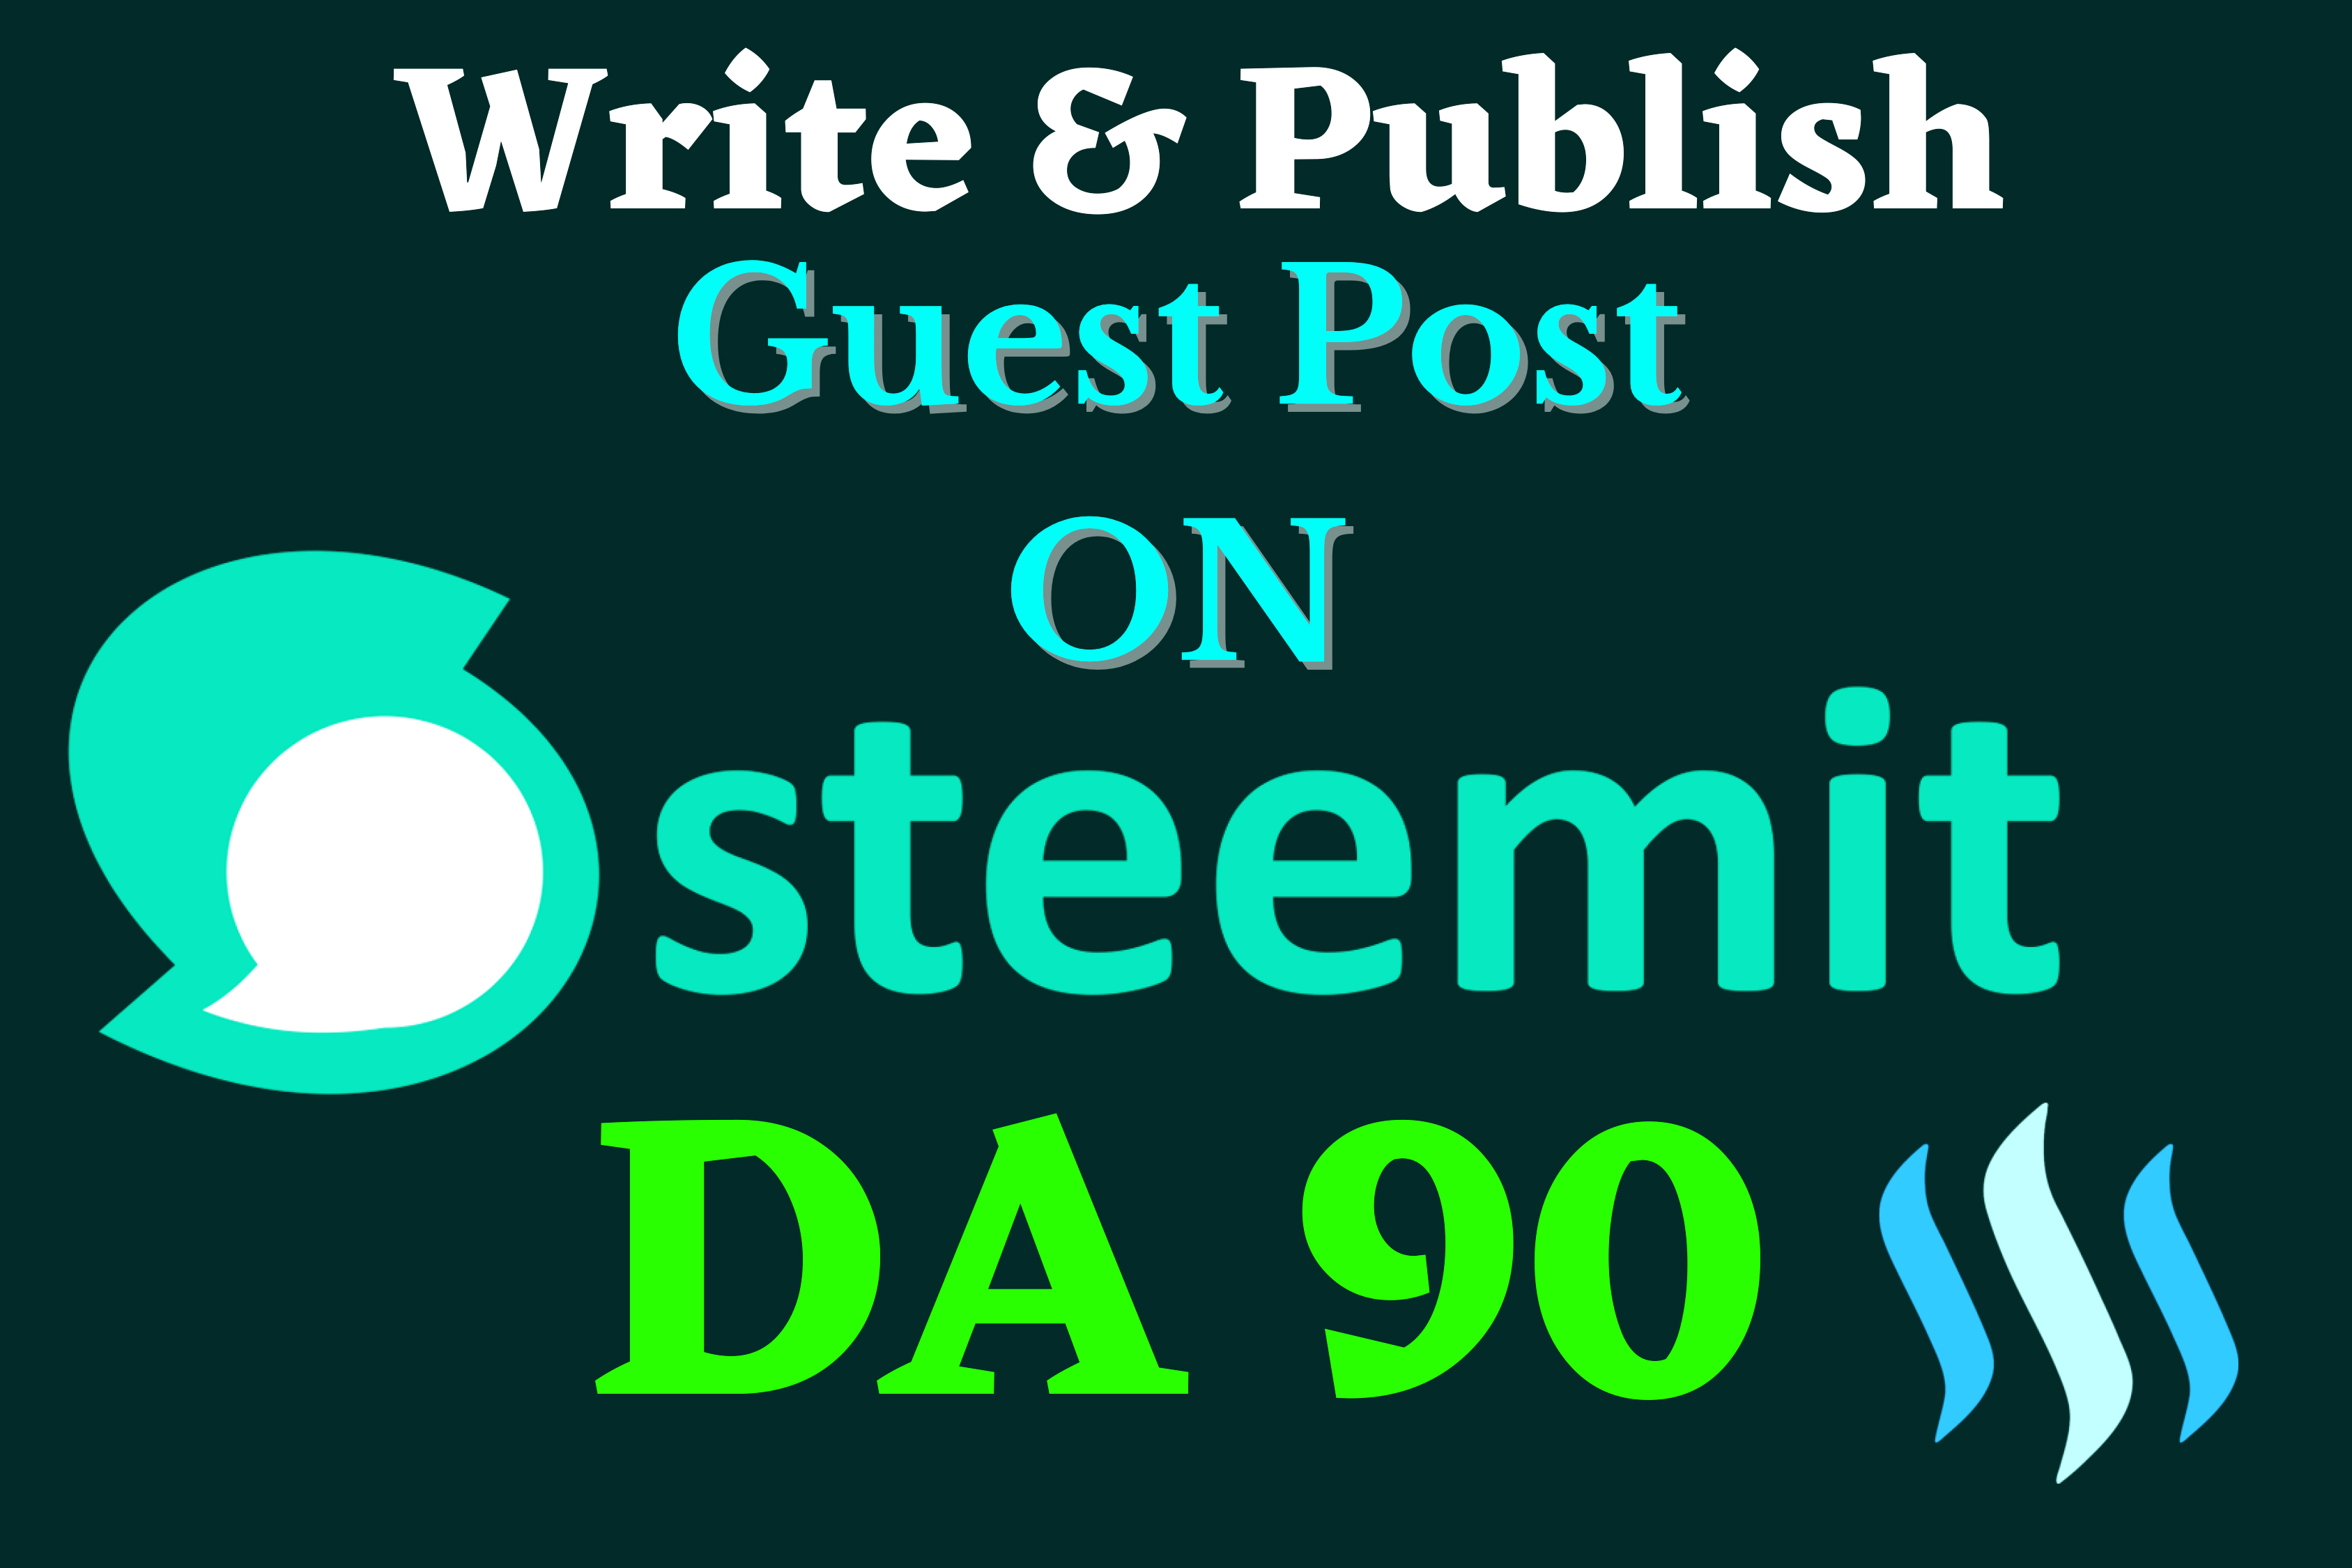 Publish DA 90 Guest Post On Steemit High Matric Backlink